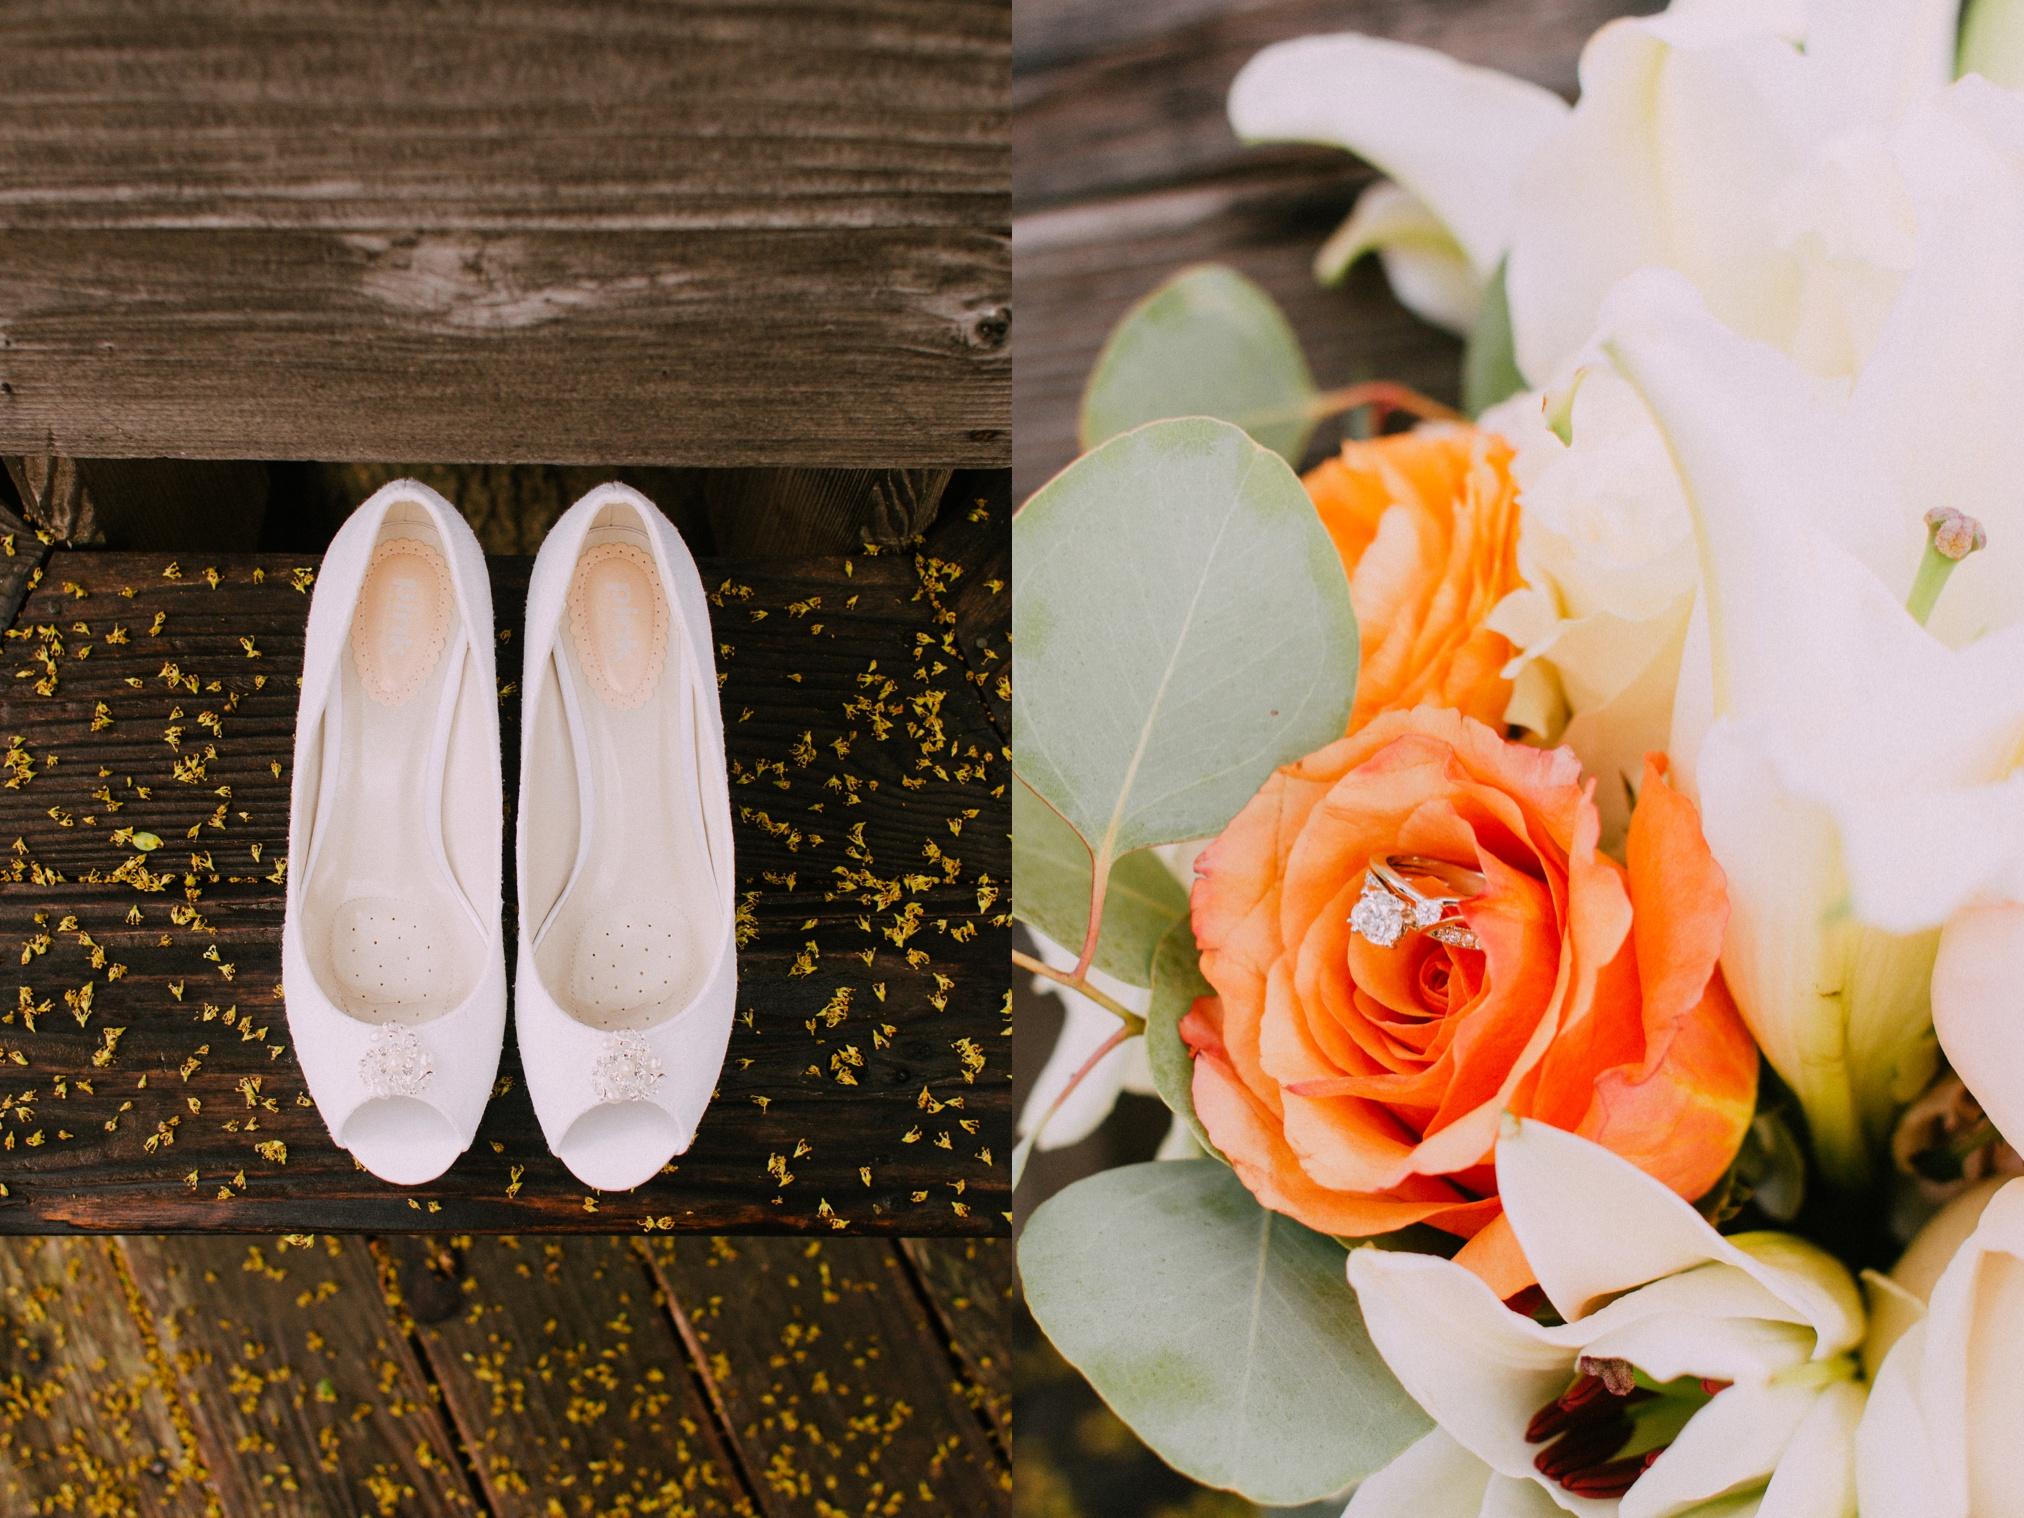 schmid_wedding-6.jpg